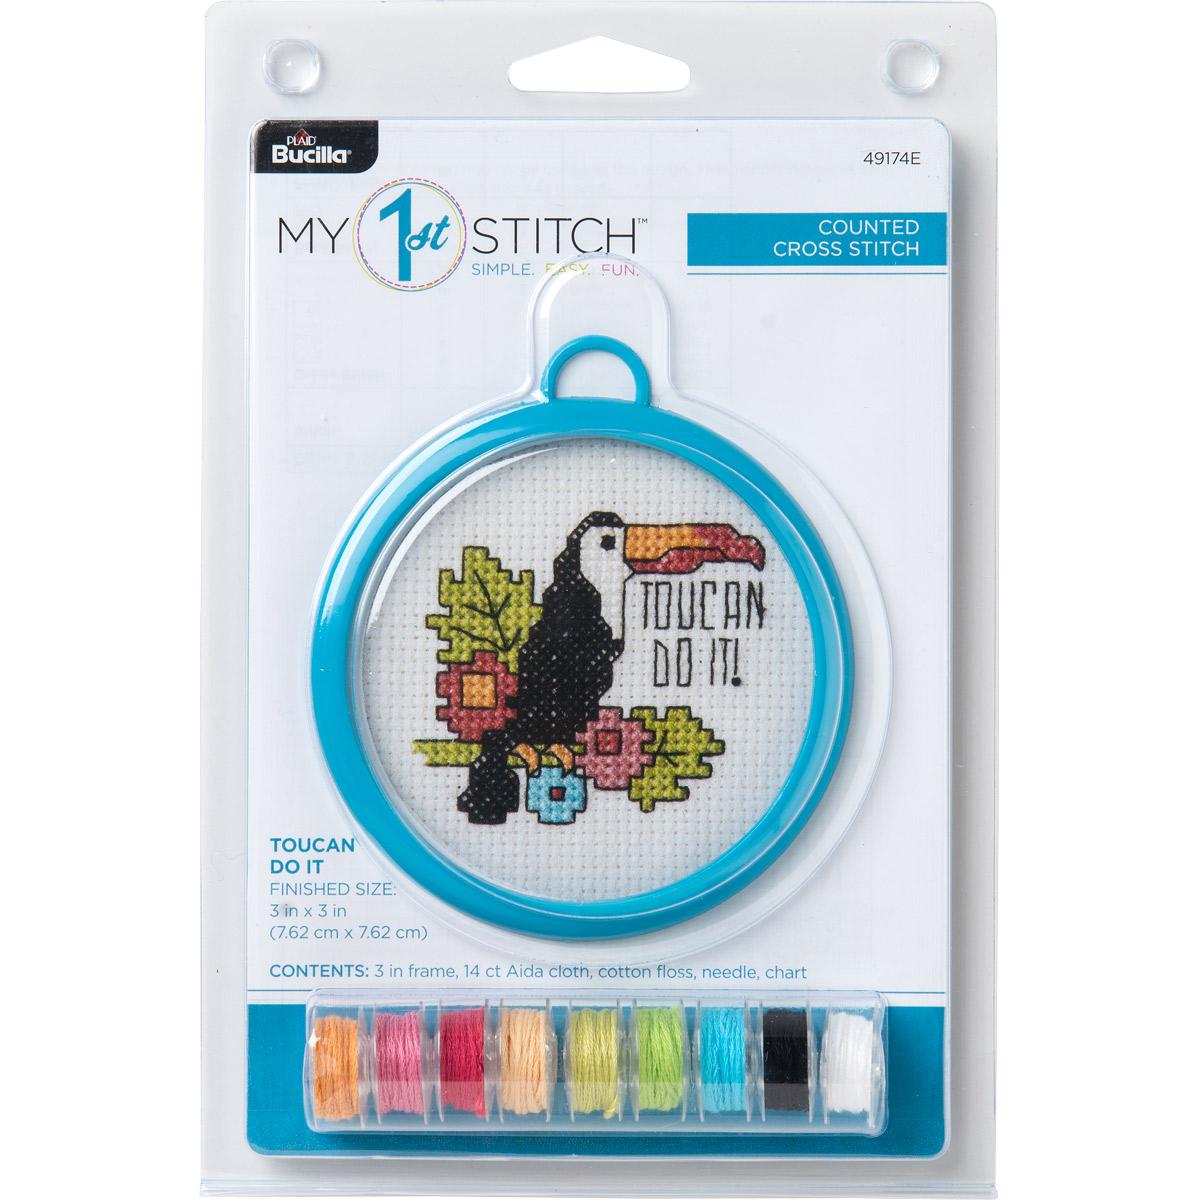 Bucilla ® My 1st Stitch™ - Counted Cross Stitch Kits - Mini - Toucan Do It